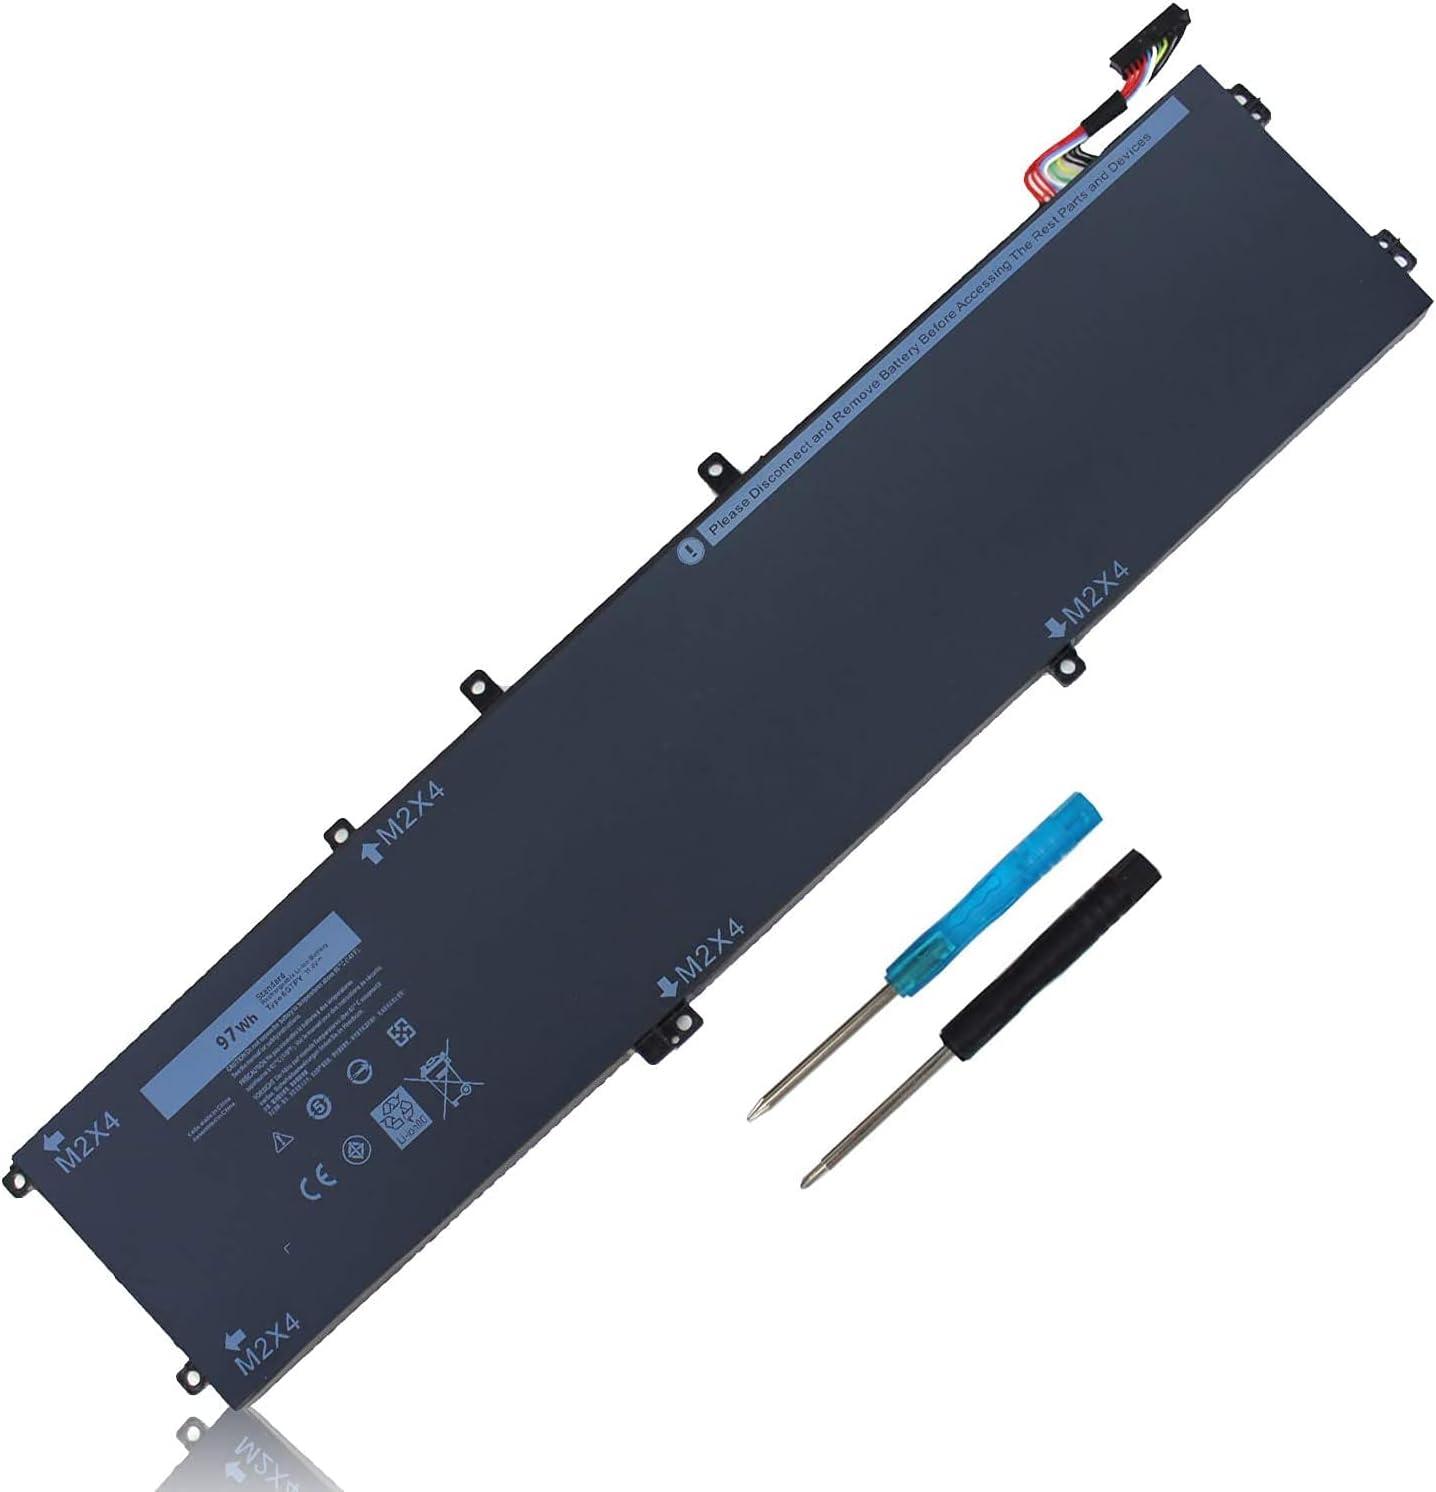 97Wh 6GTPY Battery for Dell XPS 15 9550 9560 9570 7590 P56F P56F001 P56F002 GPM03, Precision 5510 5520 5530 5540 M5520 M5510 Workstation Replacement, Vostro 7500 7590, M2X4 5XJ28 05XJ28 5D91C